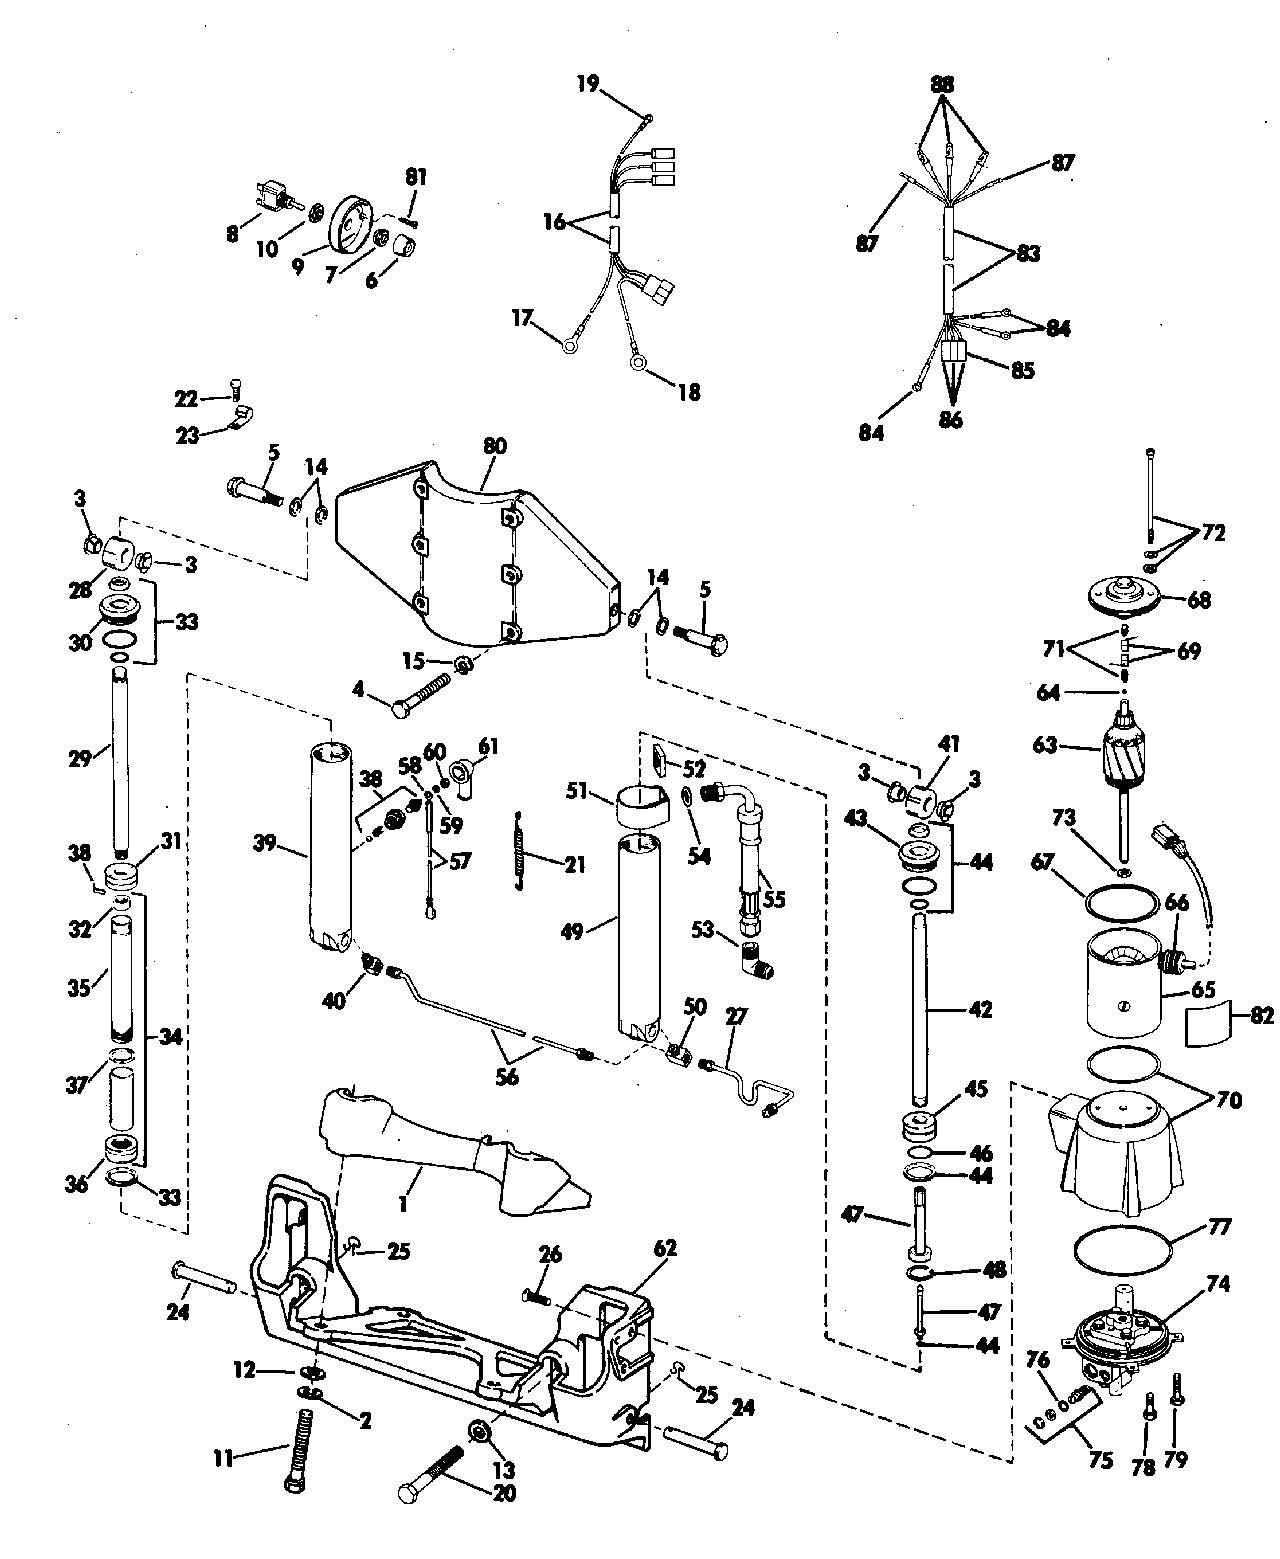 hight resolution of brp evinrude en 1981 60 e60tlcih 1981 power tilt and trim